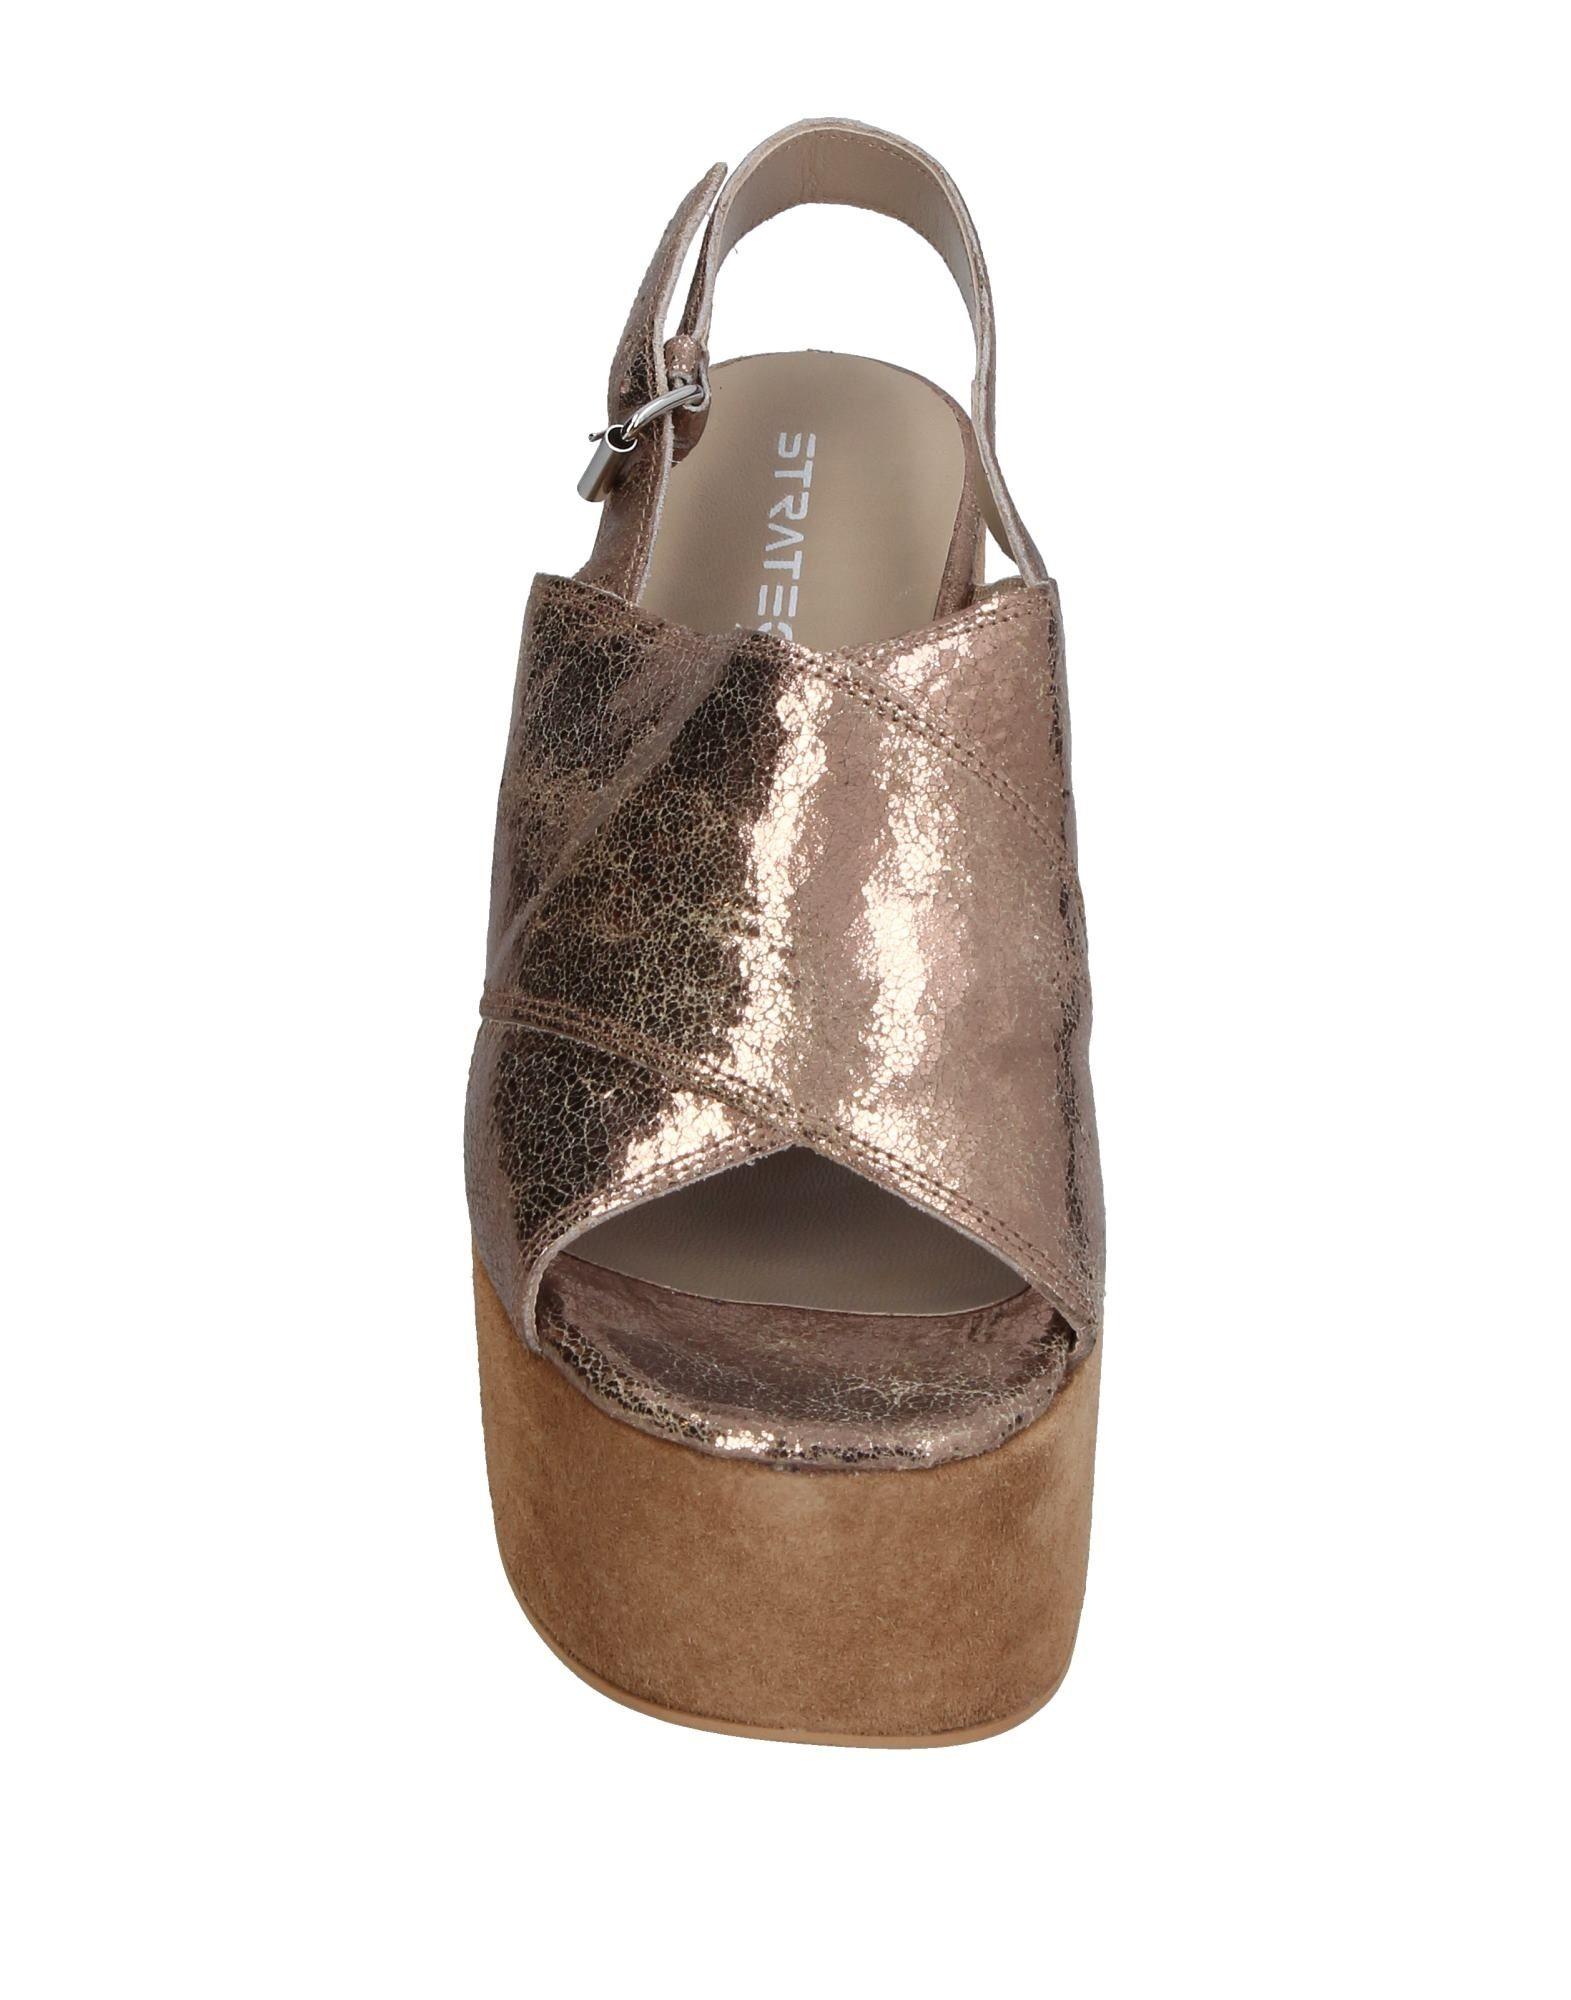 Stilvolle billige Schuhe Strategia Strategia Schuhe Sandalen Damen  11381415PD b50b7f